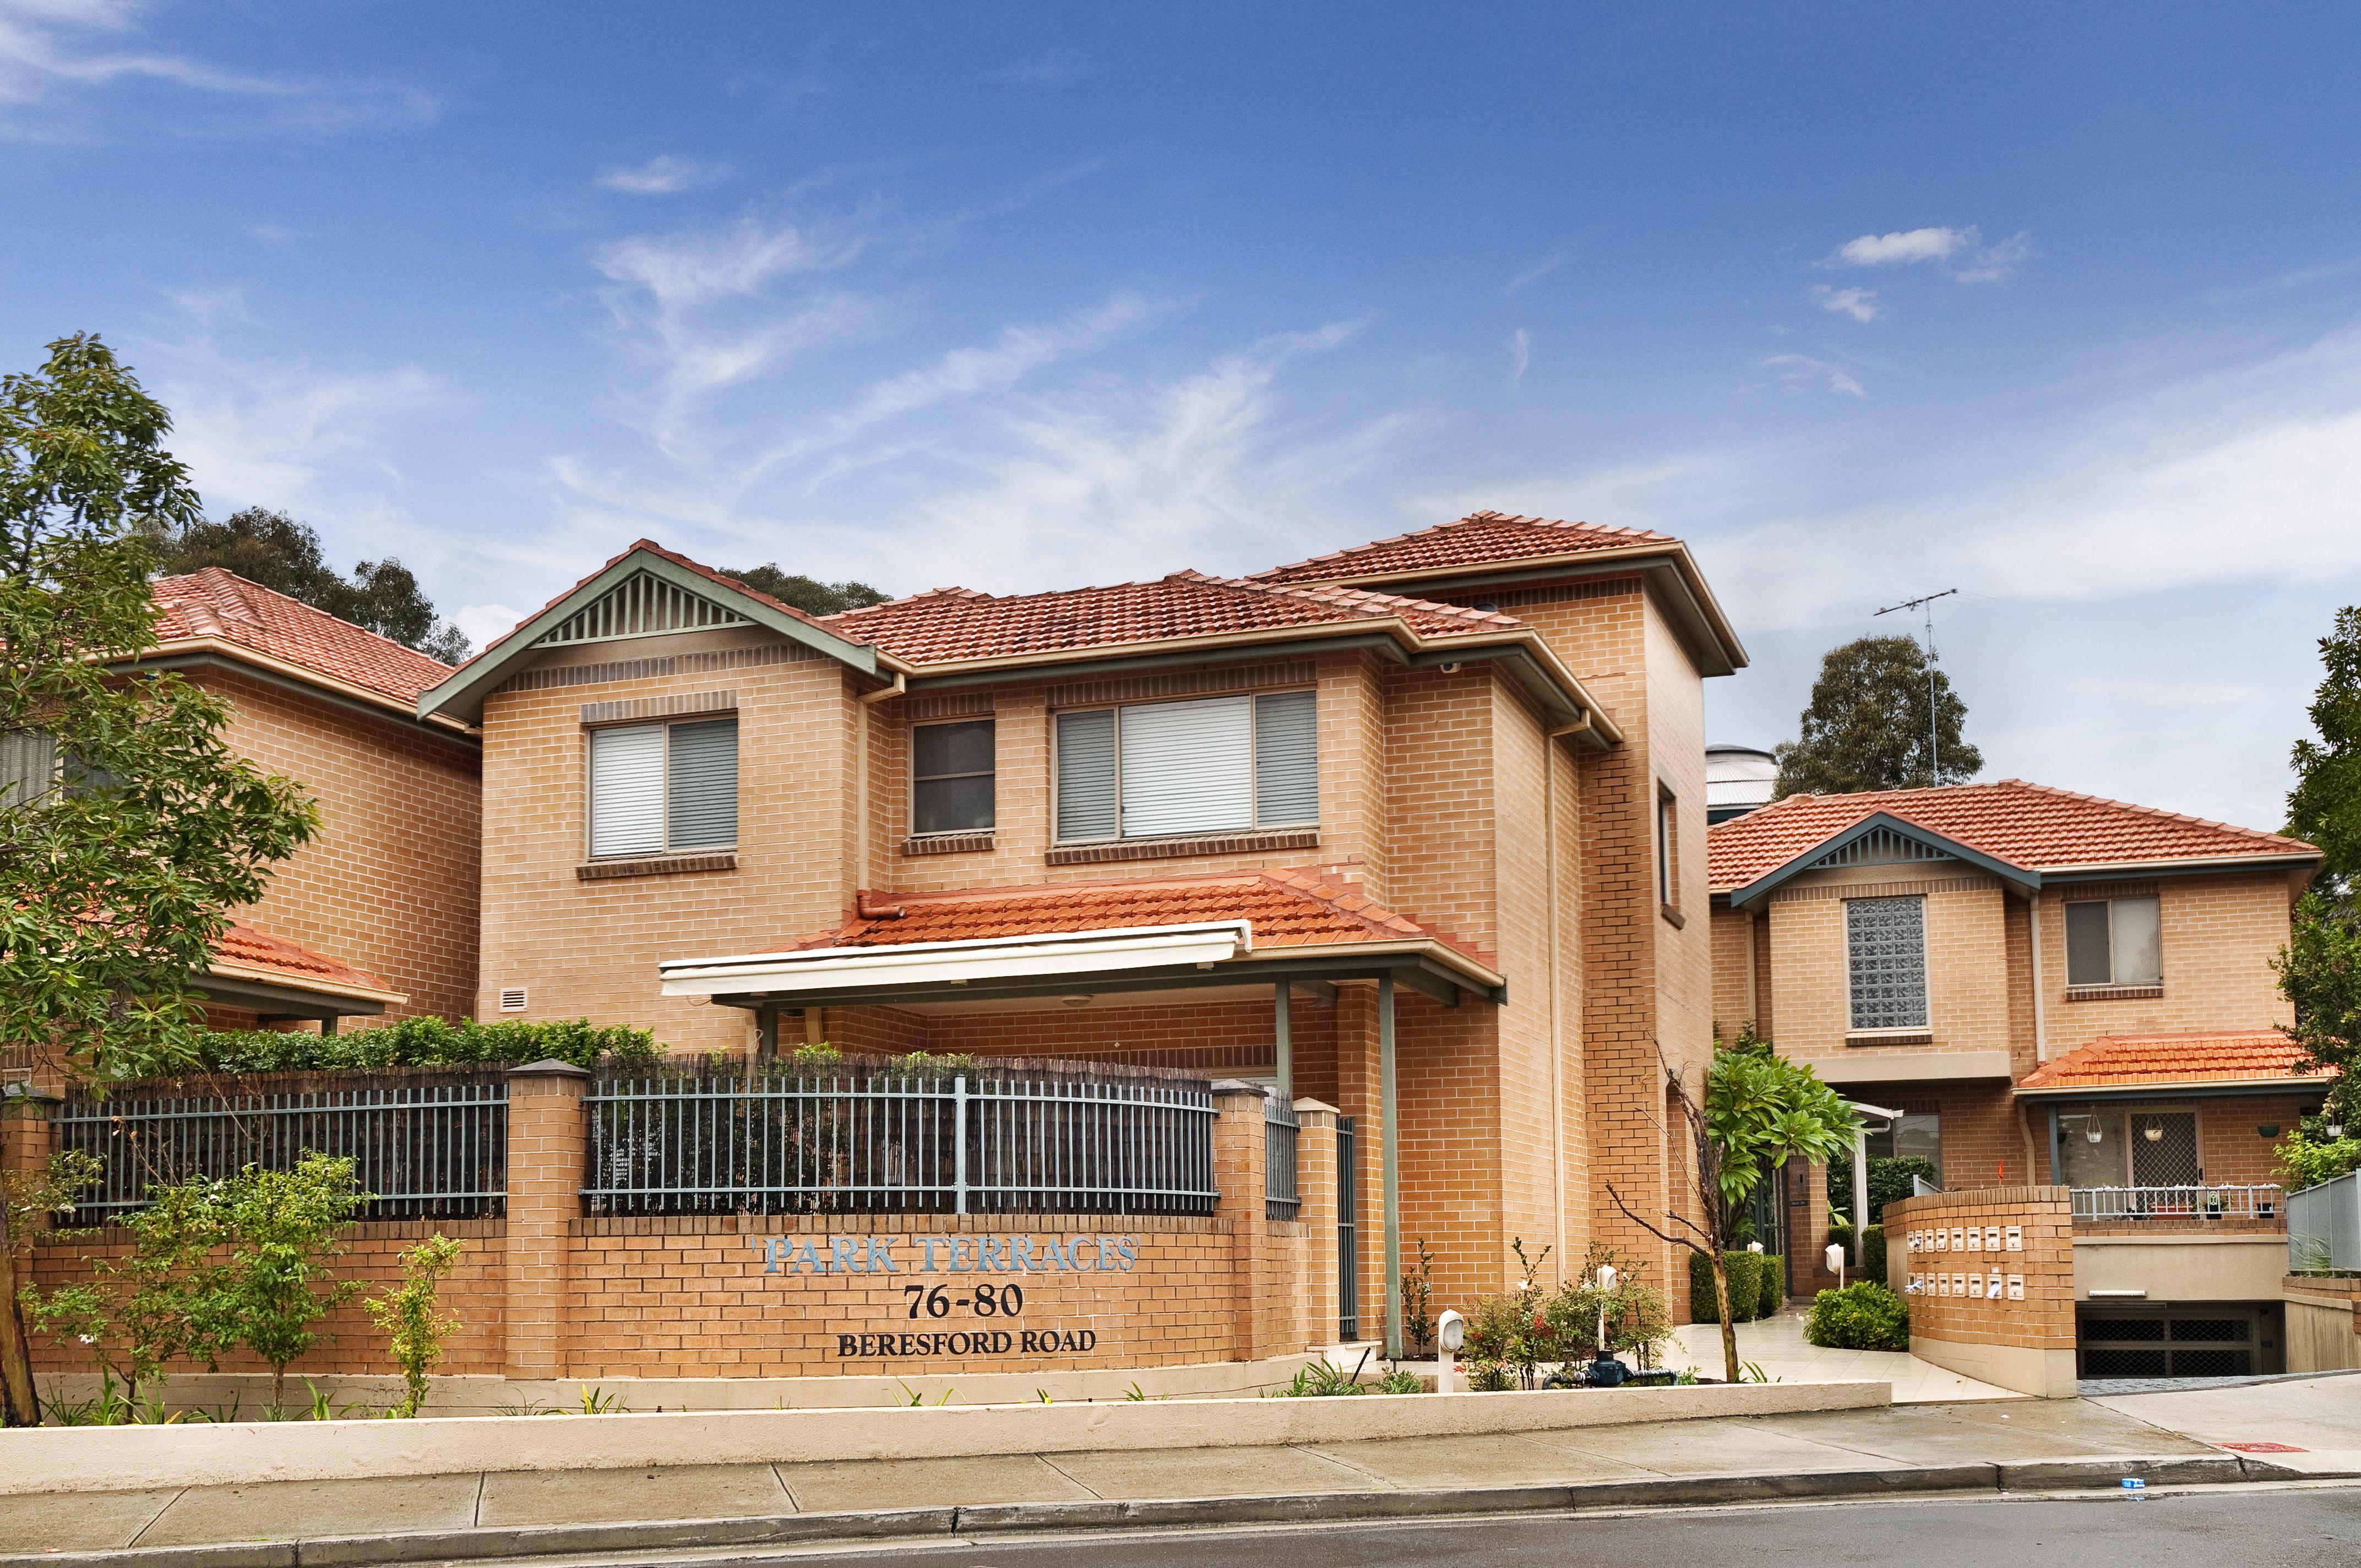 4/76-80 Beresford Road, Strathfield NSW 2135